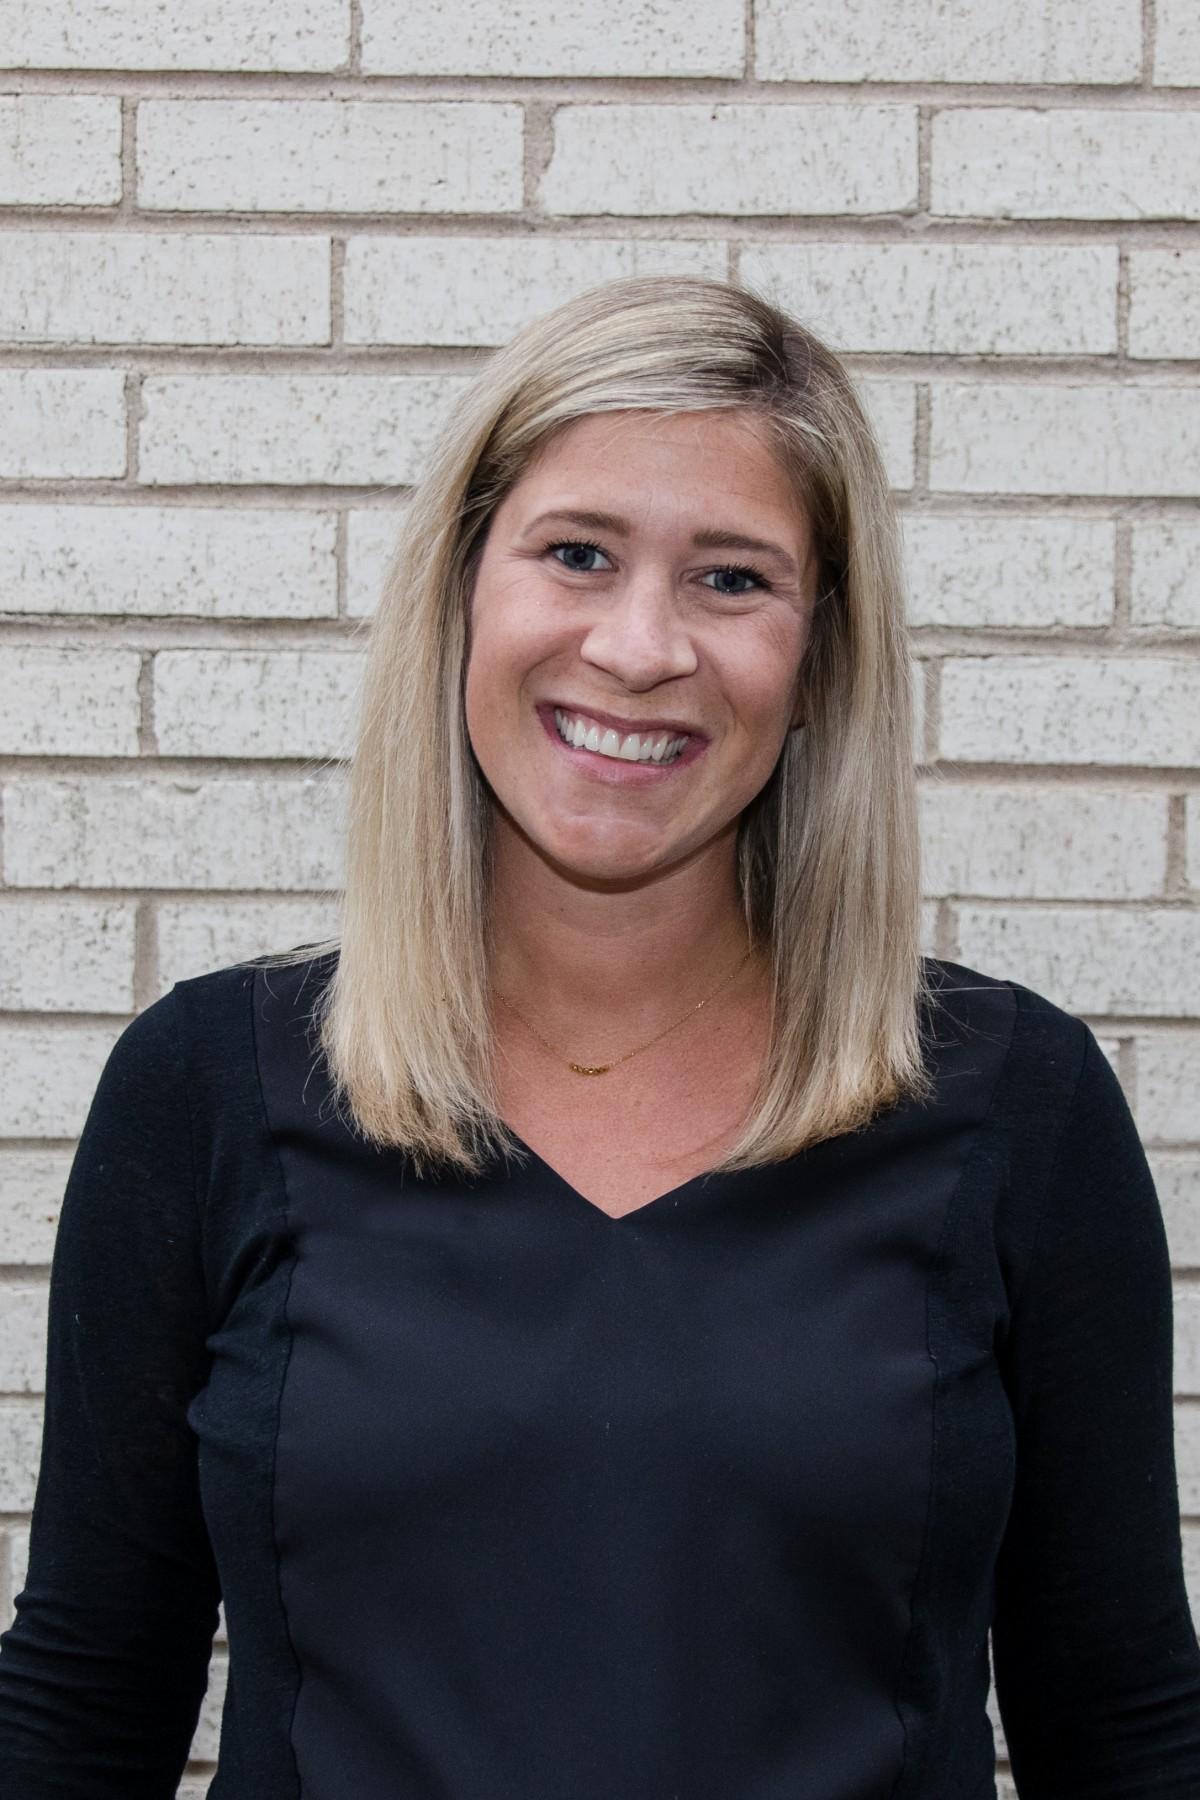 Lindsay Recsetar, LCSW